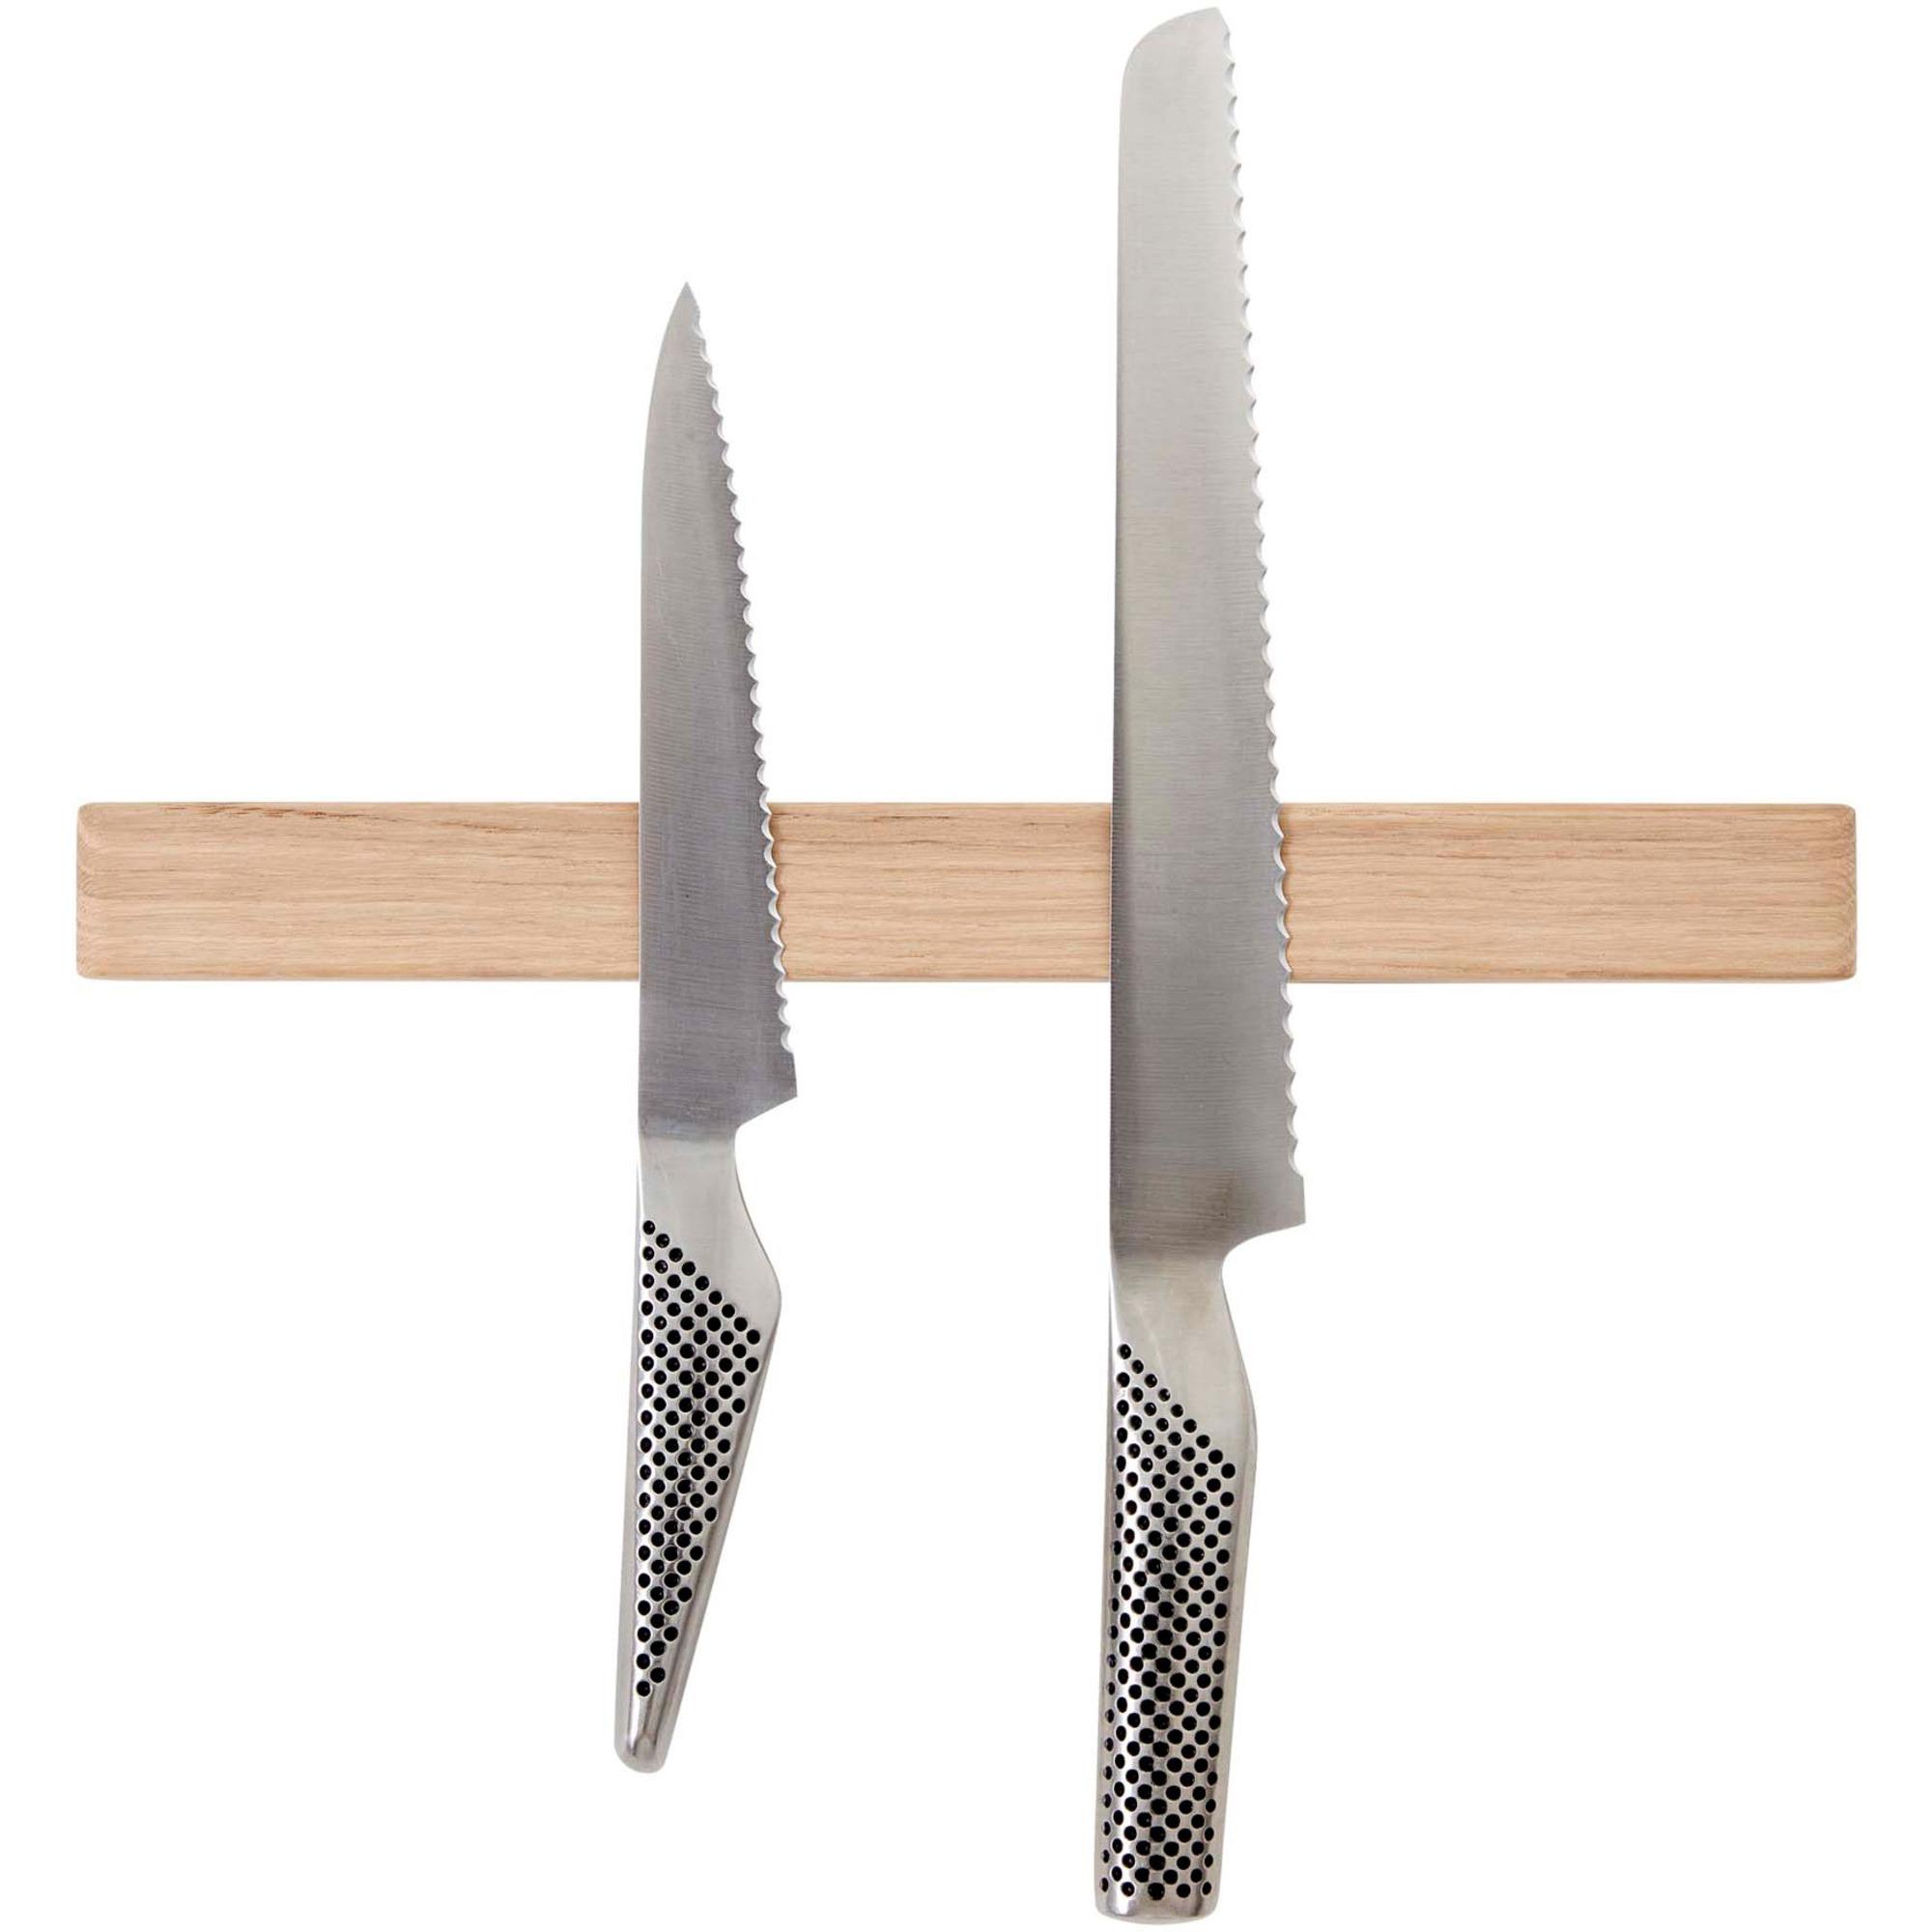 Andersen Furniture Knivlist 32 cm Oak